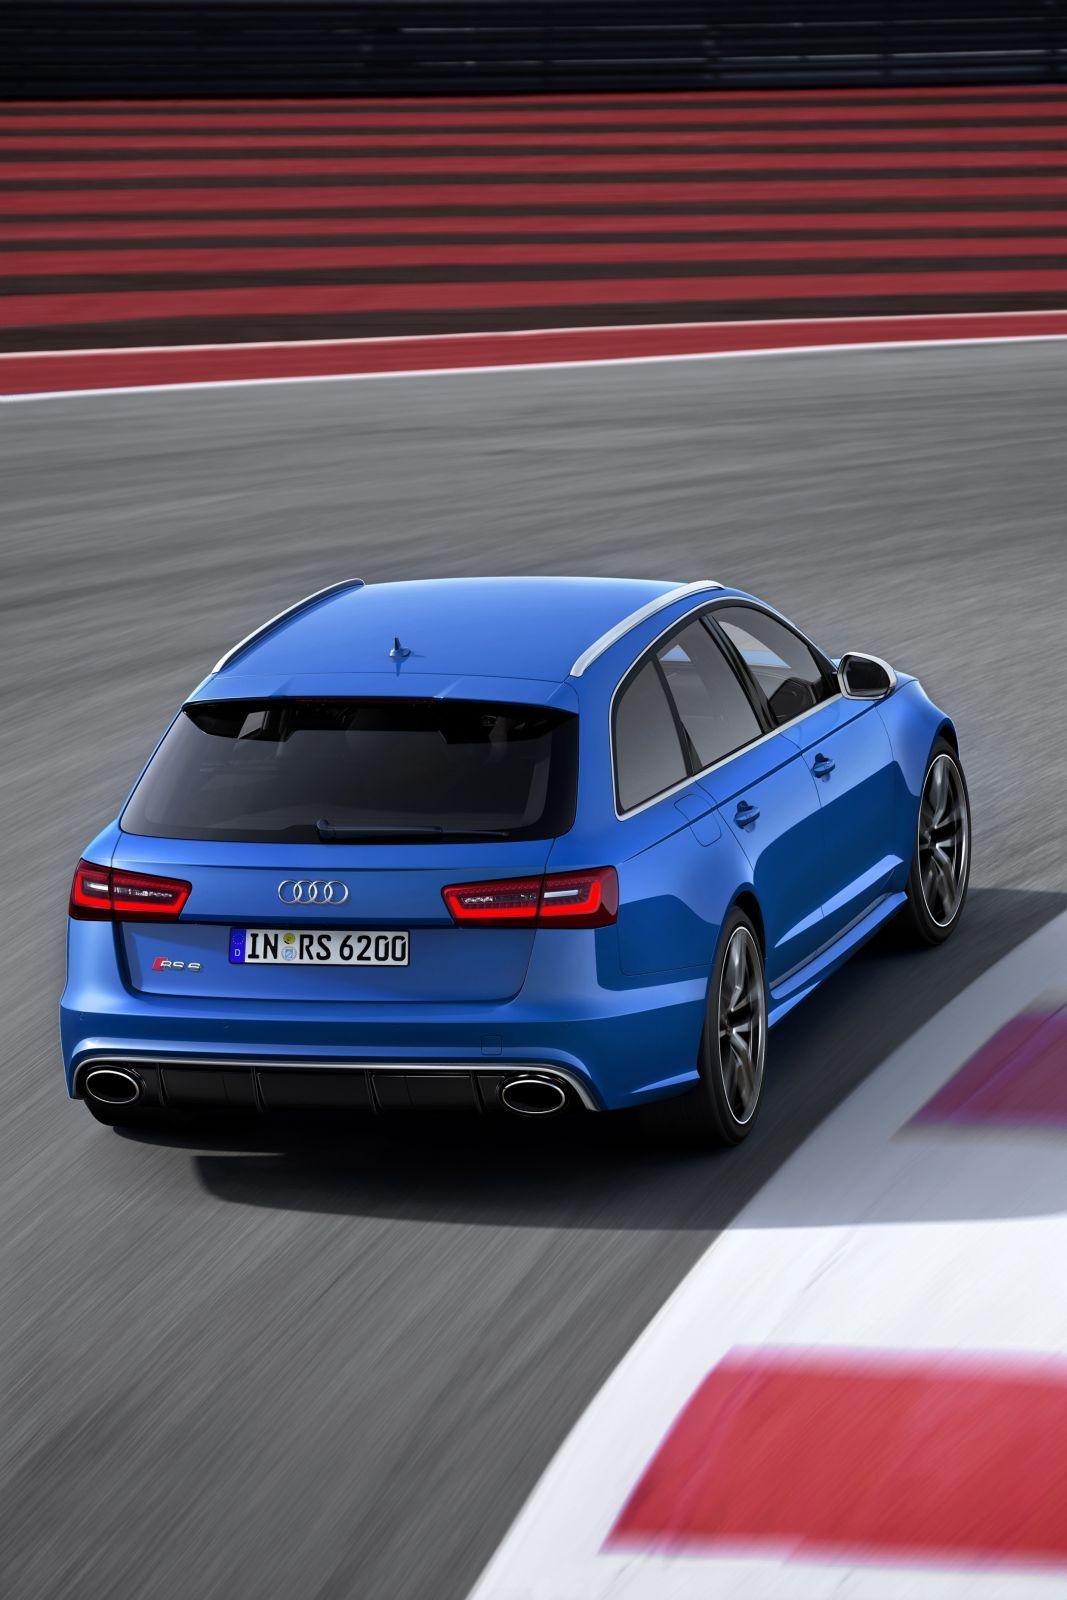 A4e Gallery Audi A6 C7 Audi Rs6 C7 Fahraufnahmen